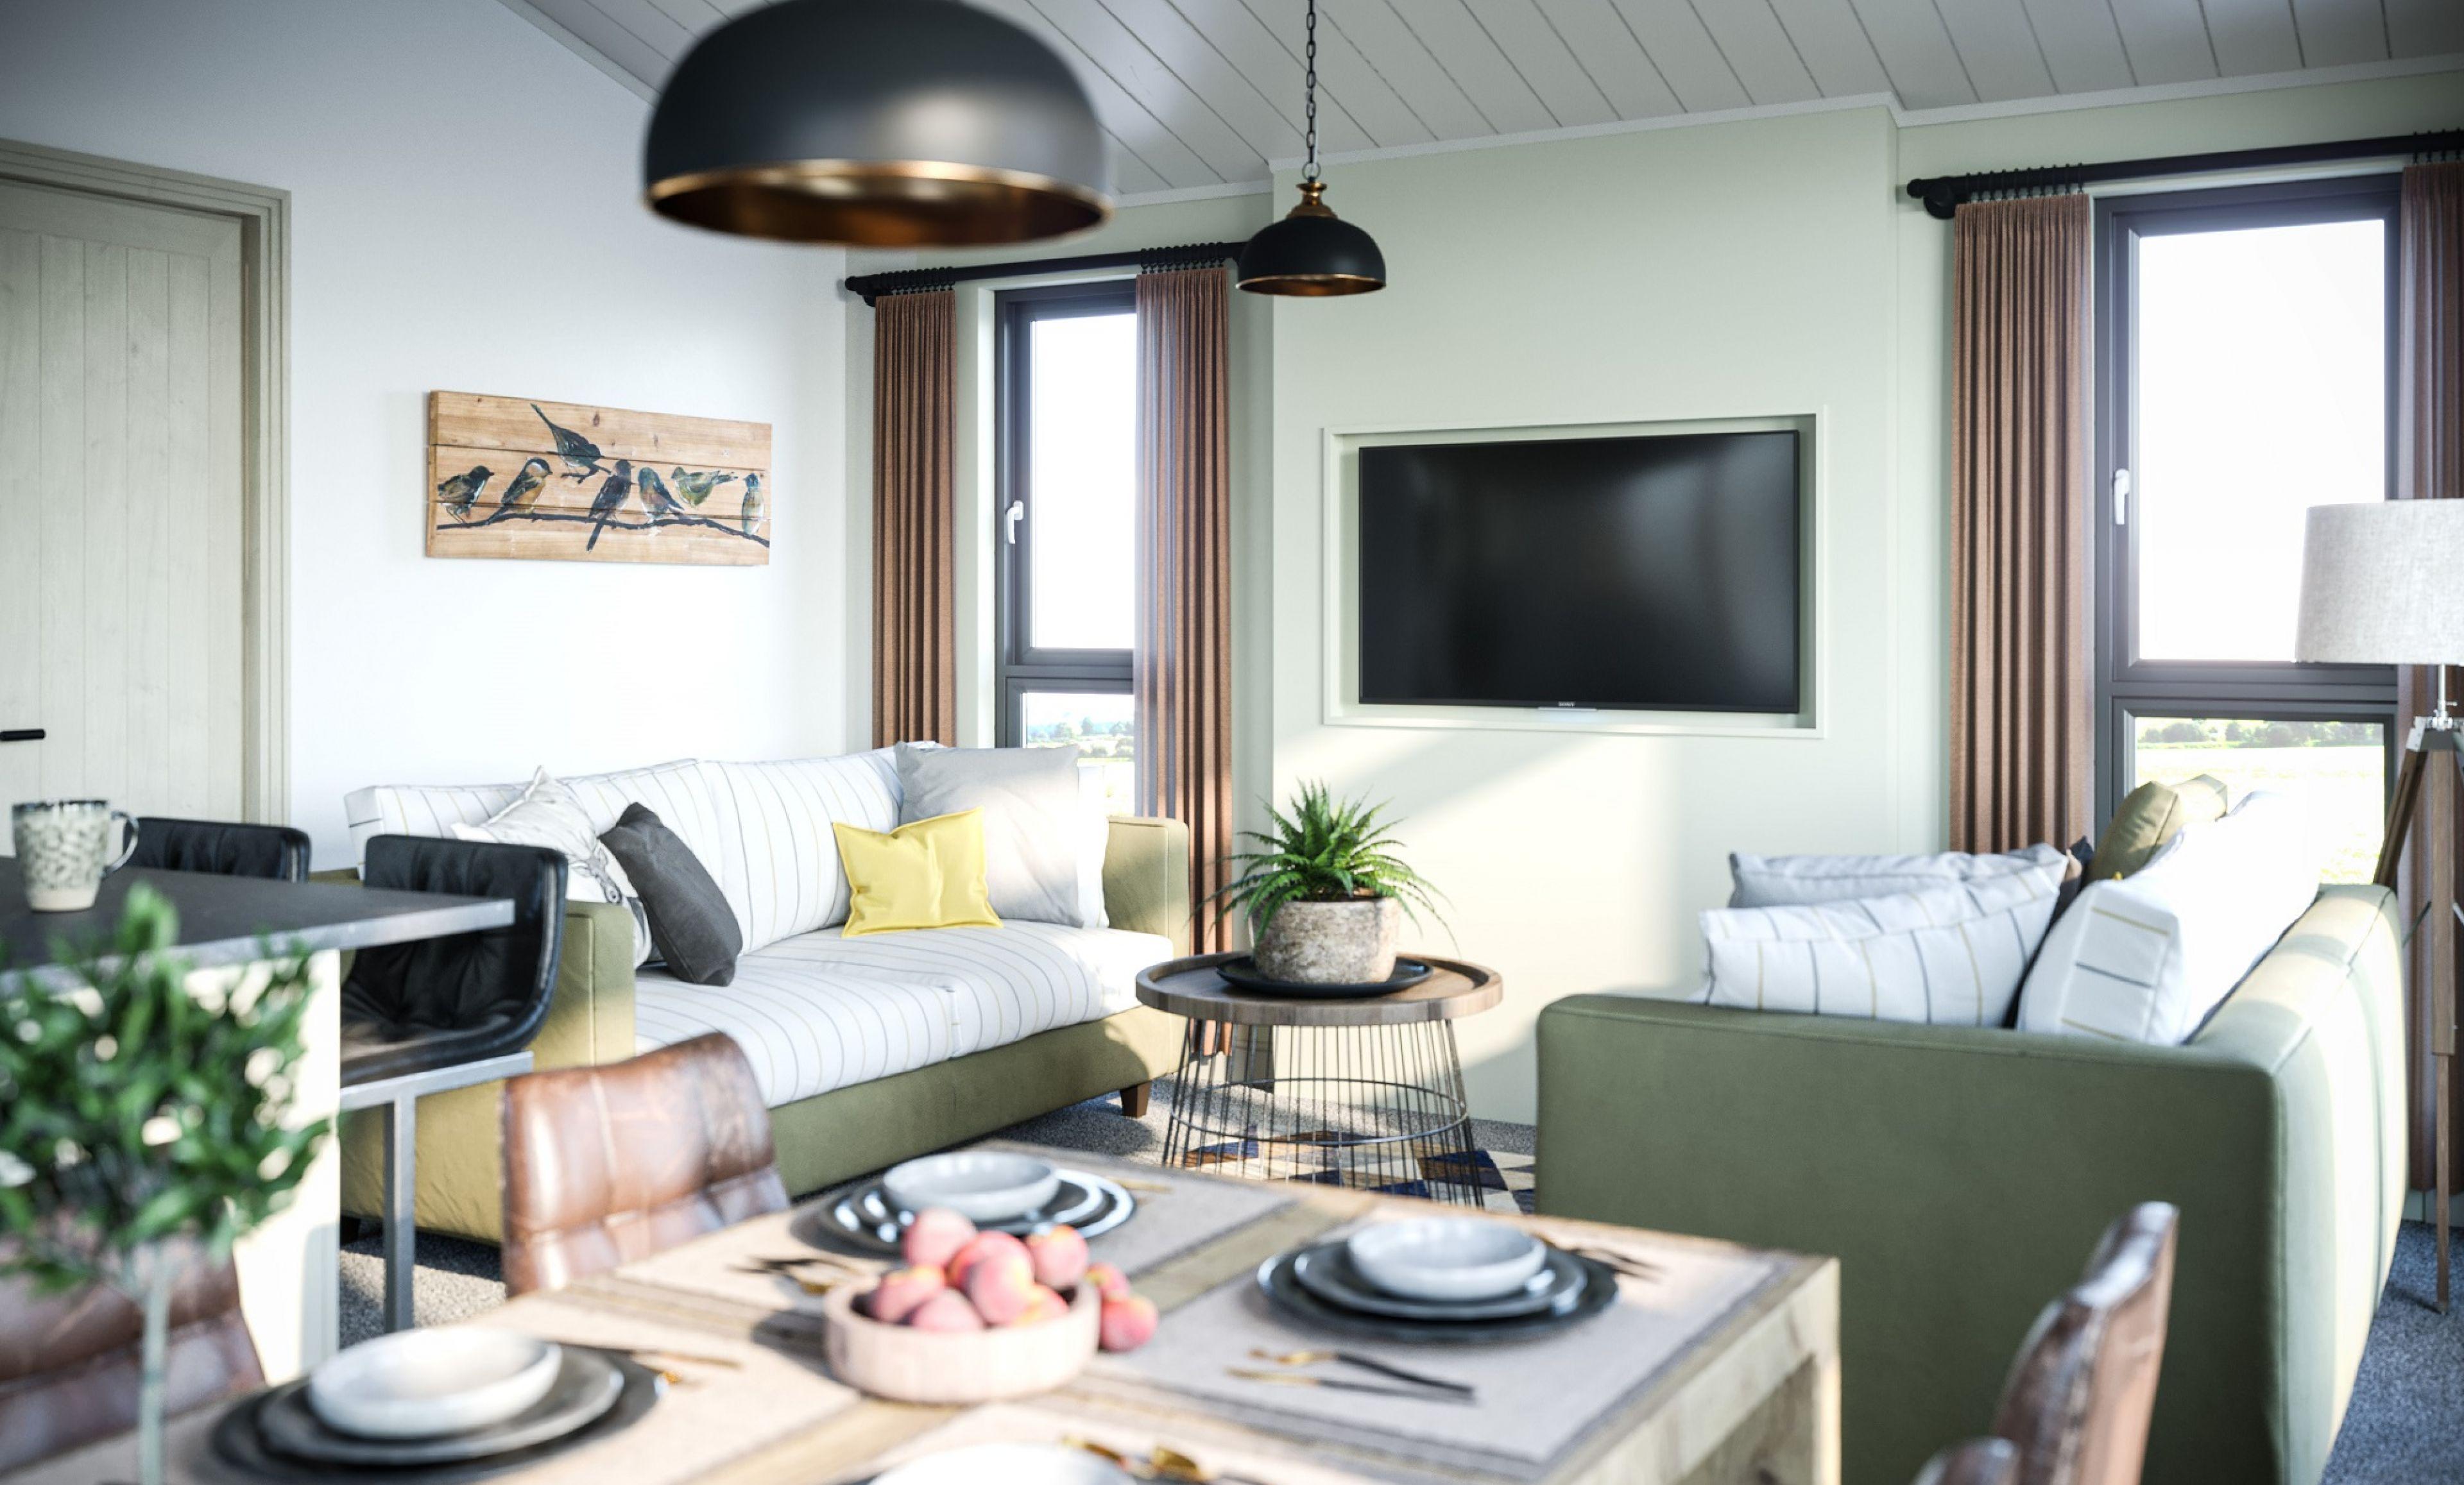 Brampton - The Living Area